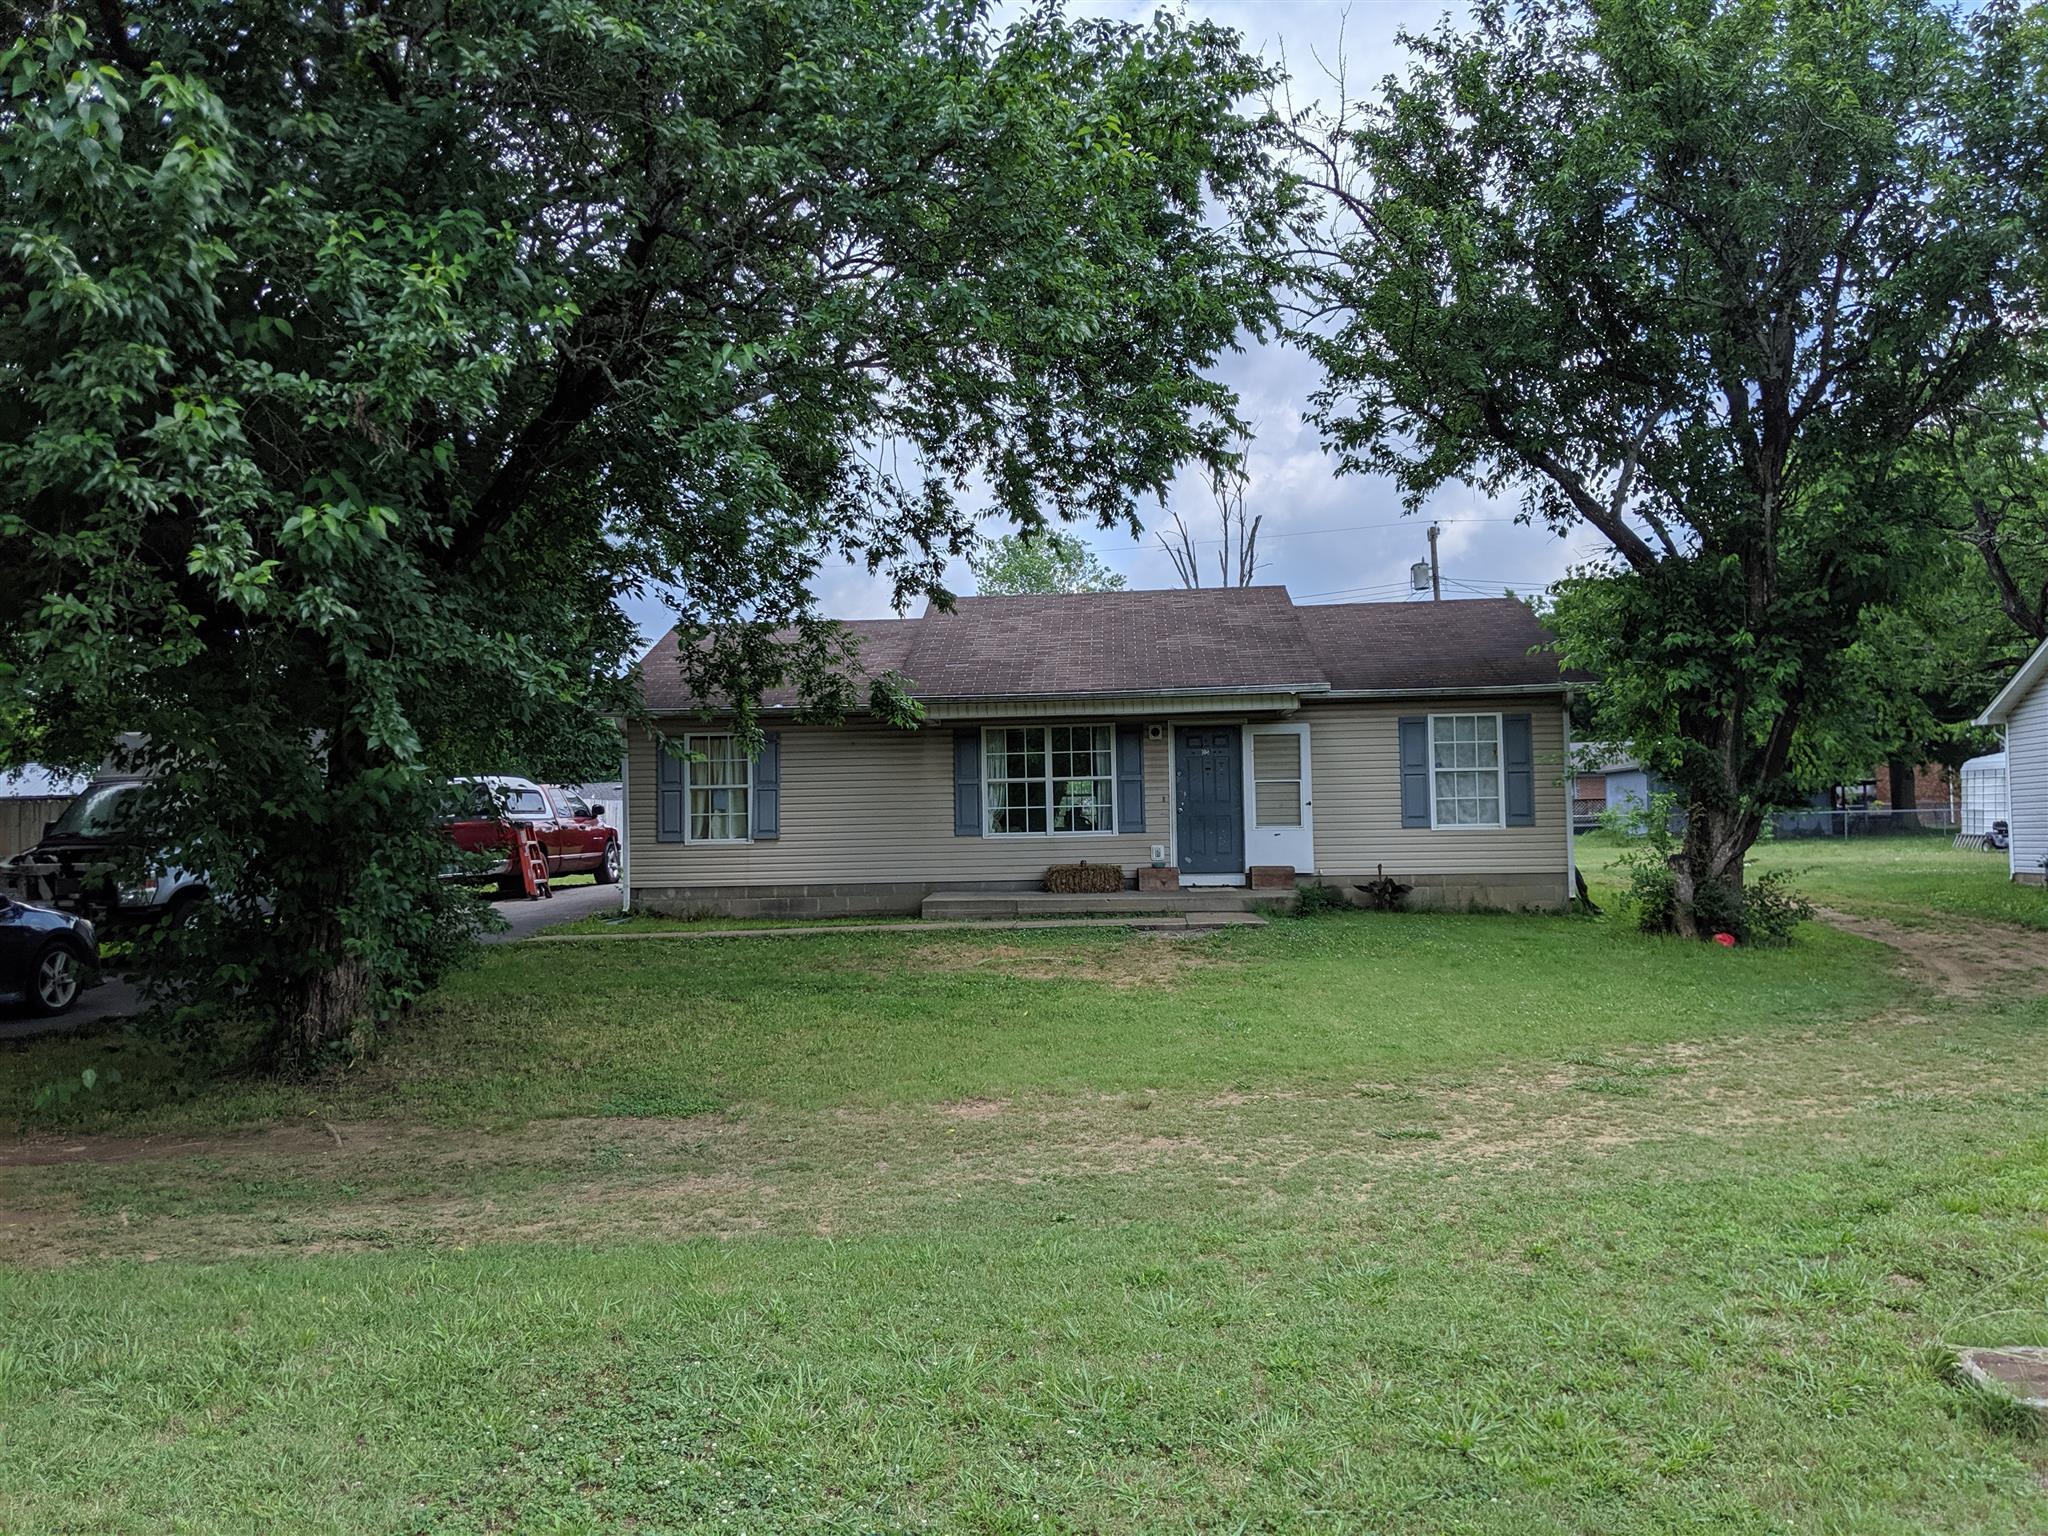 108 Clinch Dr, Columbia, TN 38401 - Columbia, TN real estate listing